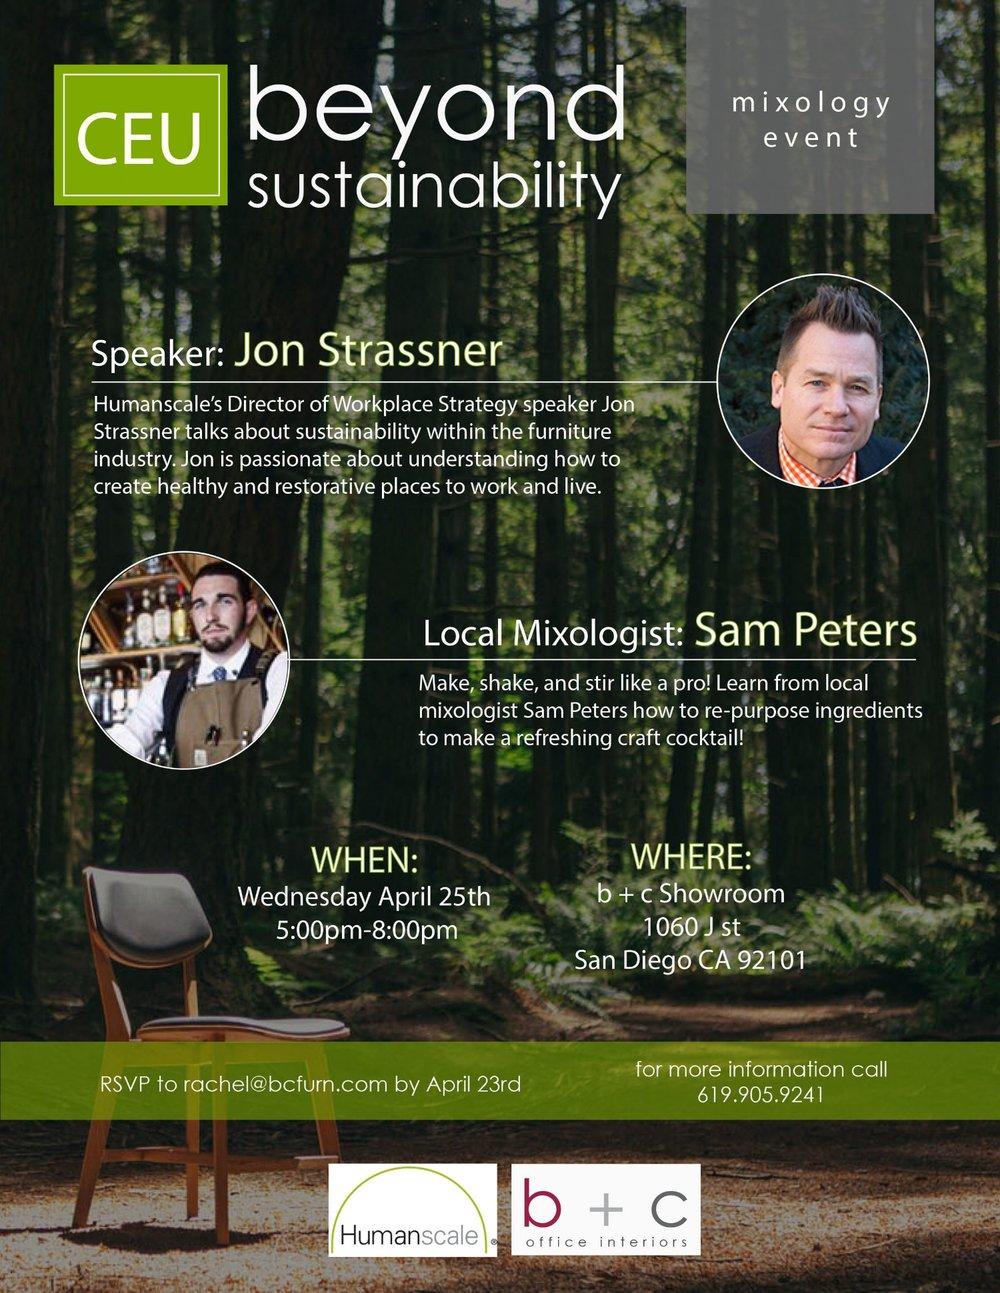 beyondsustainabilityflyerexample